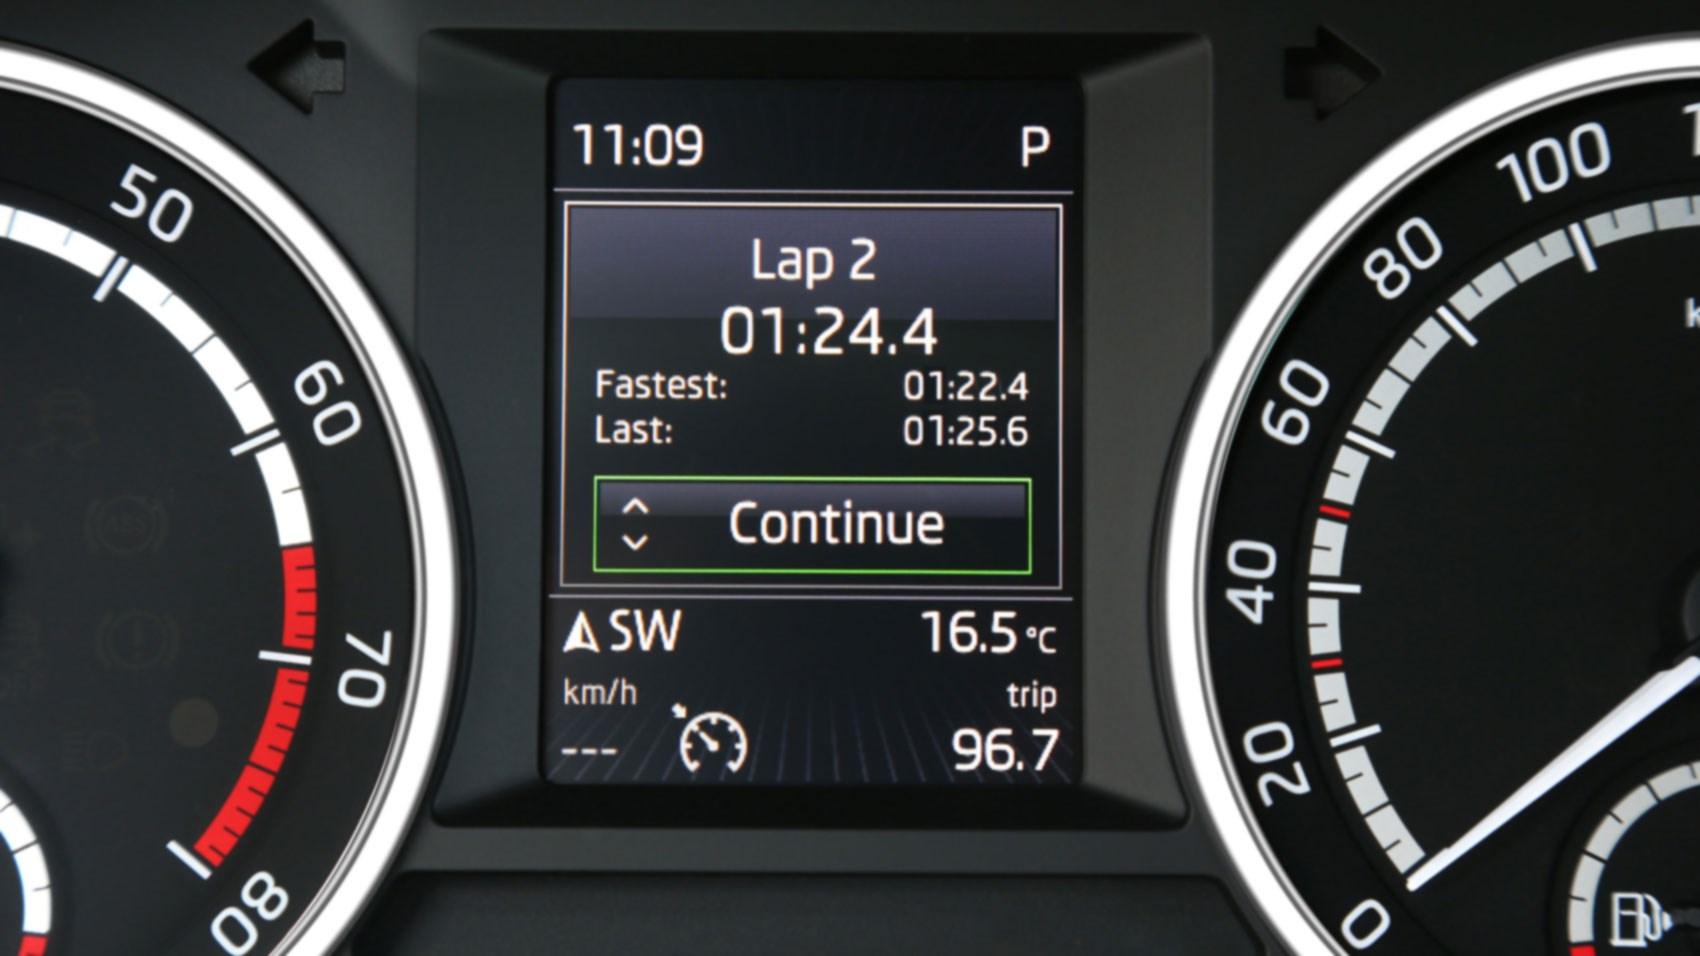 Skoda octavia vrs 230 2015 review by car magazine for Skoda frankfurter ring